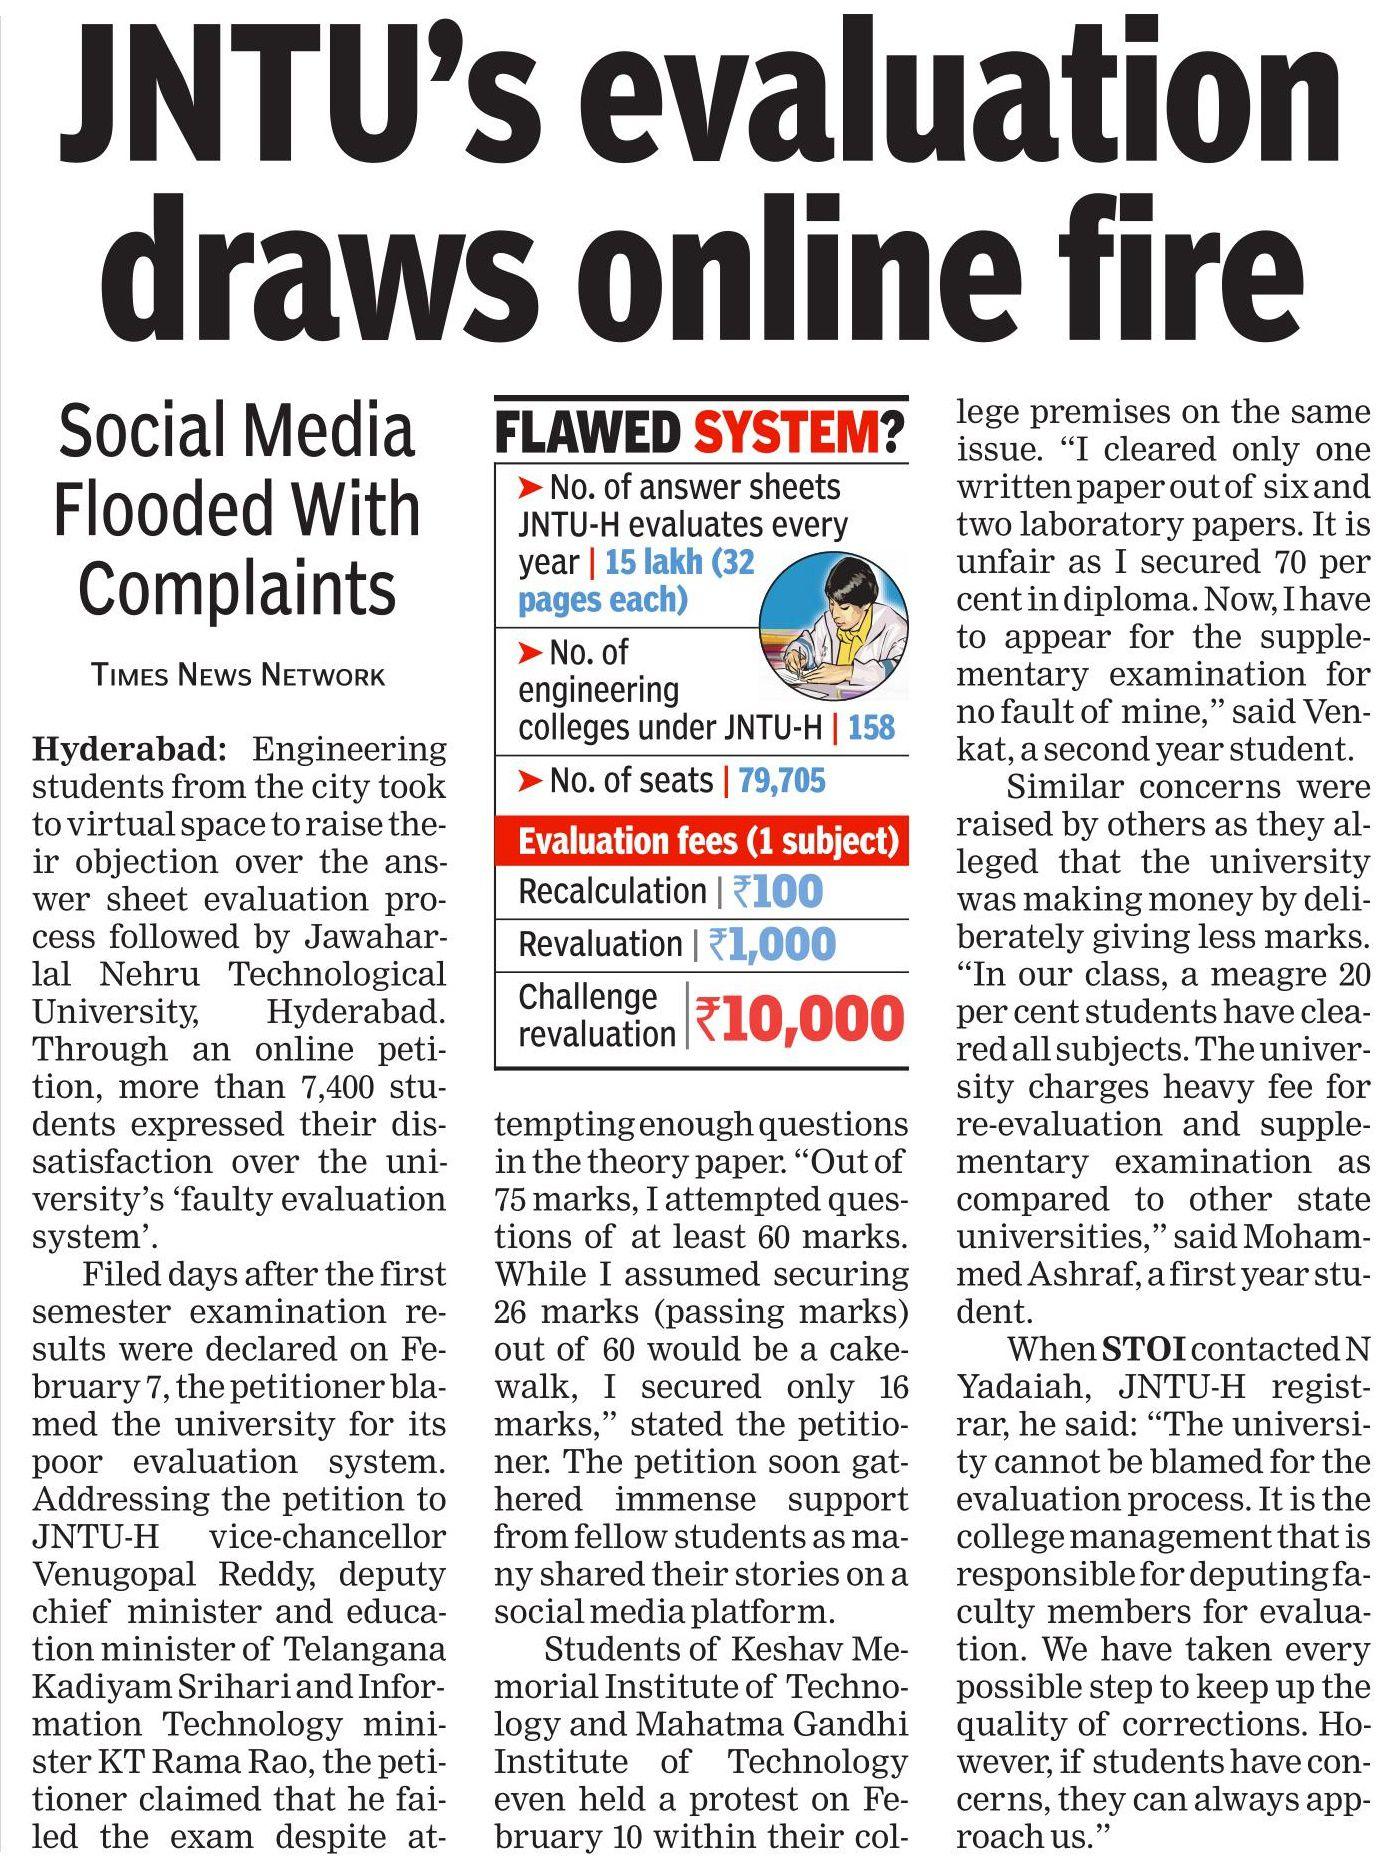 jntu evaluation draws online fire